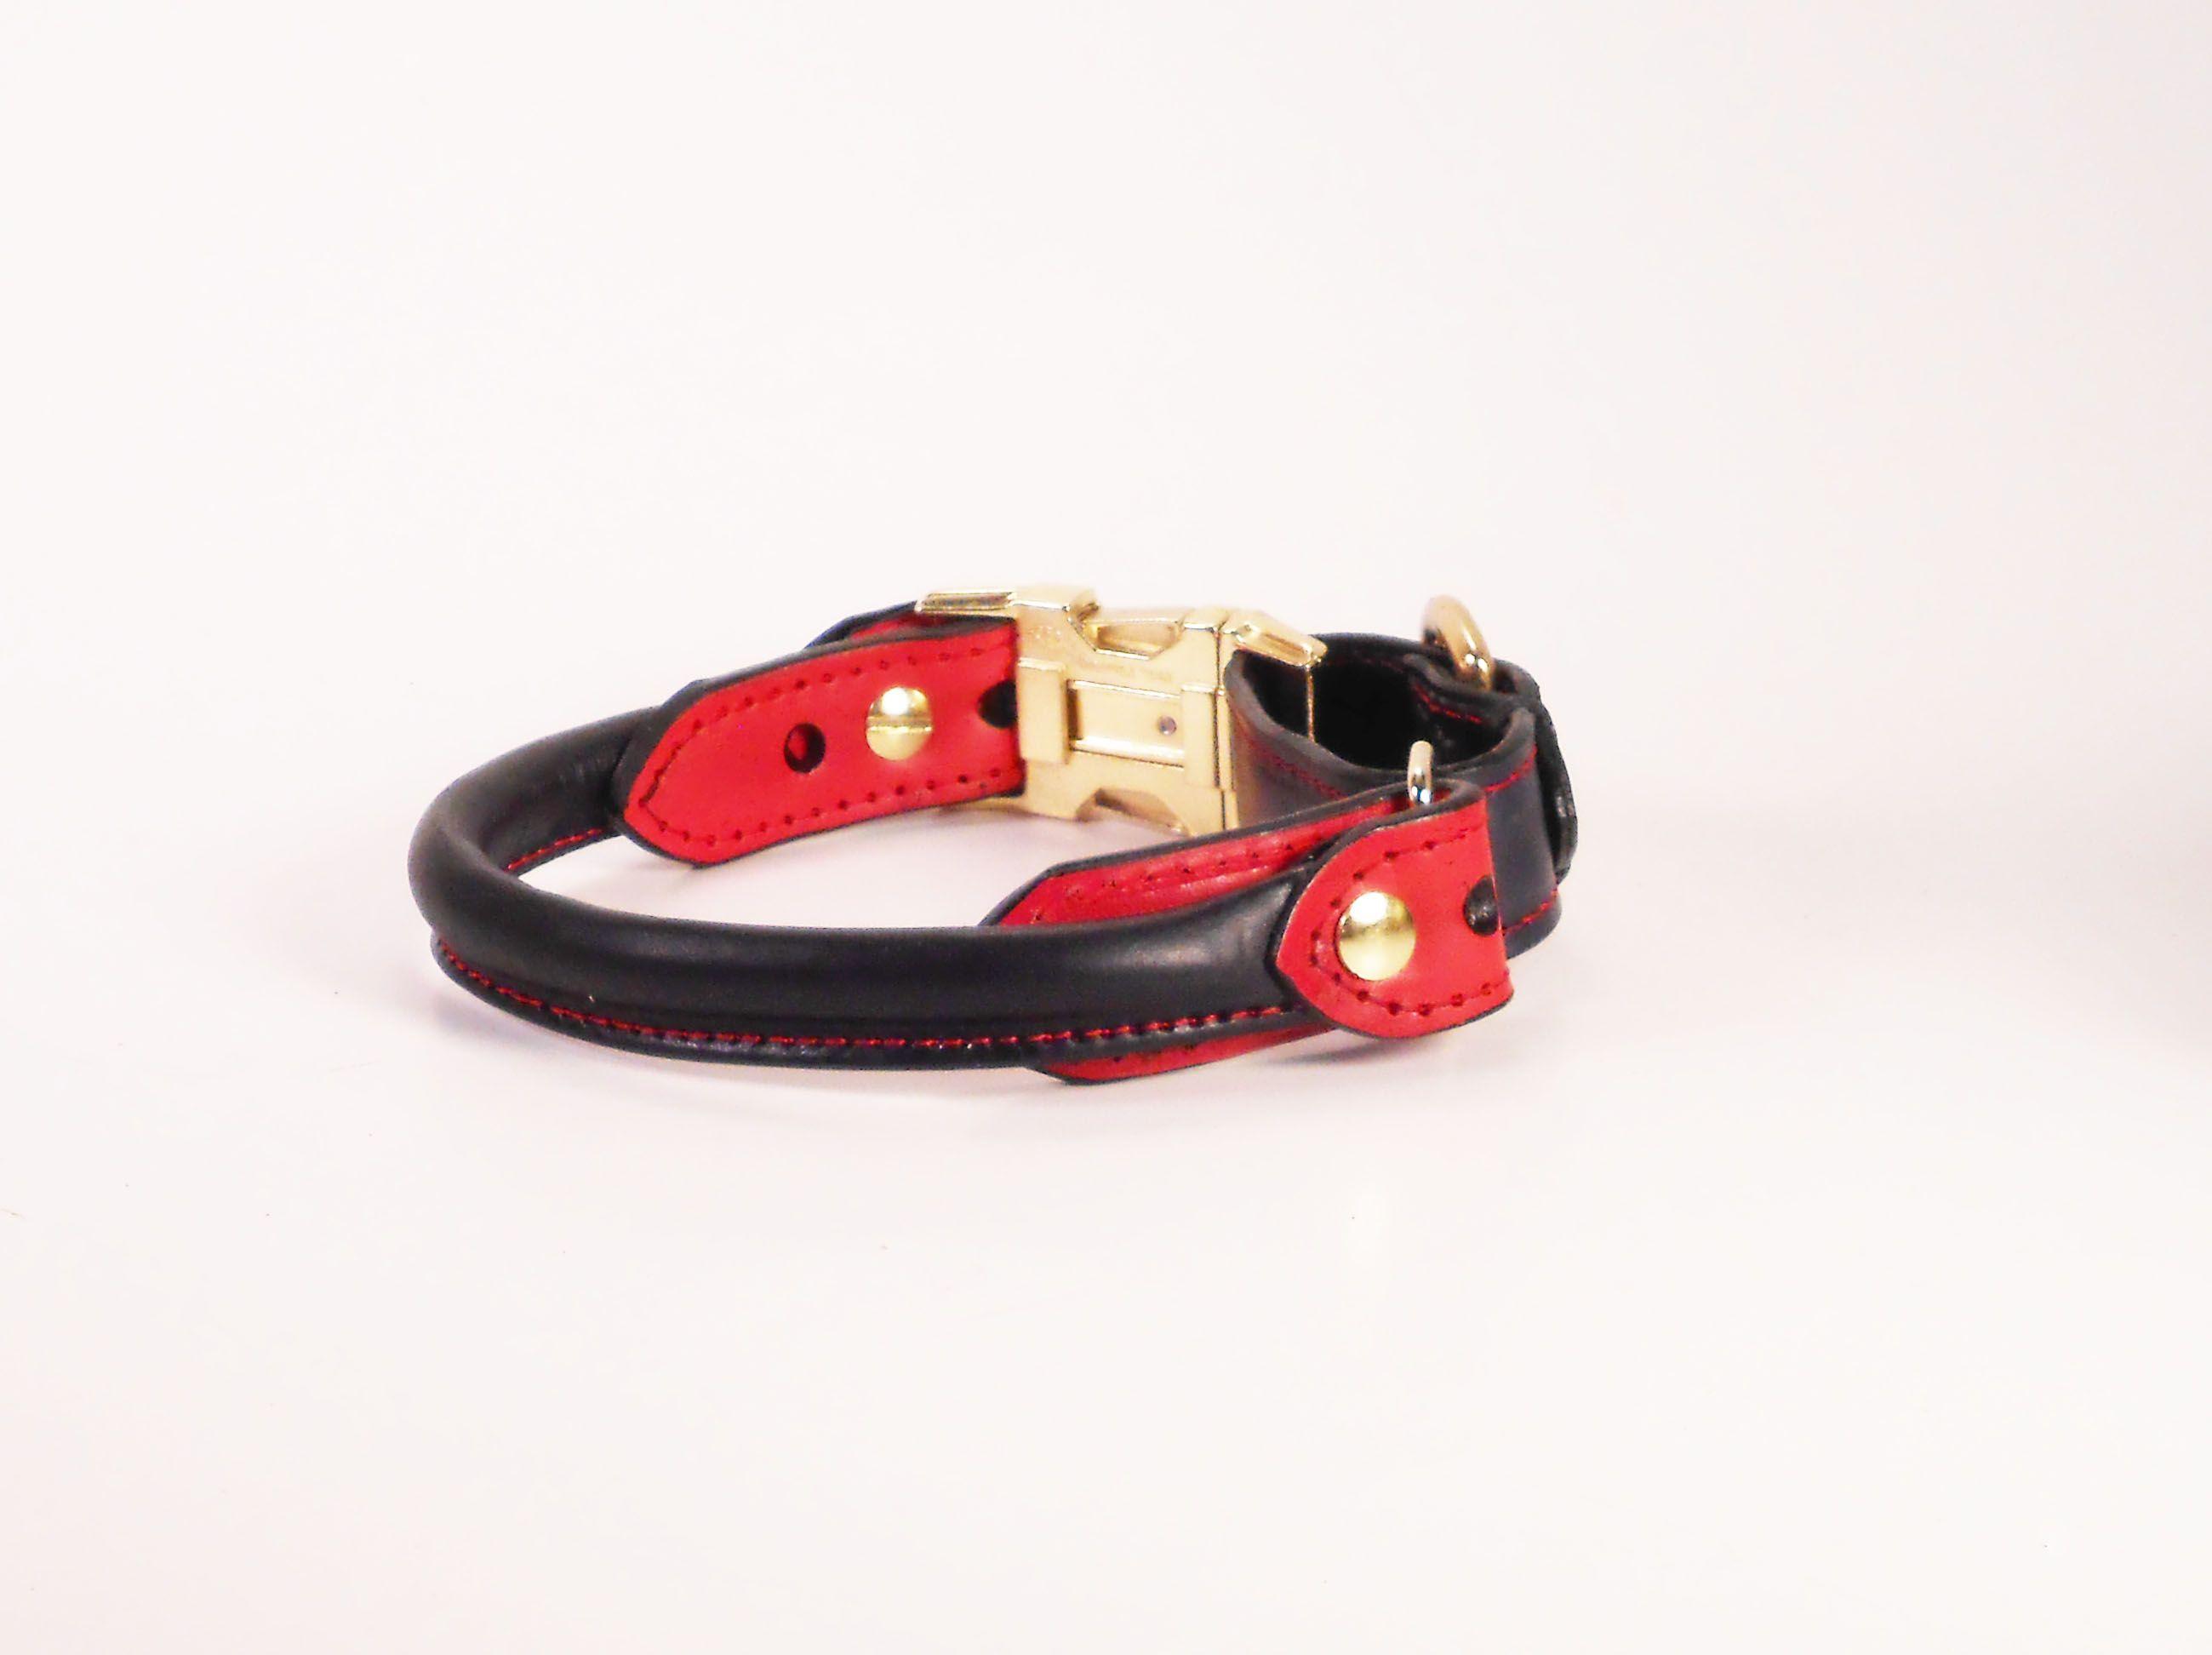 Custom Hand Made Leather Dog Collars